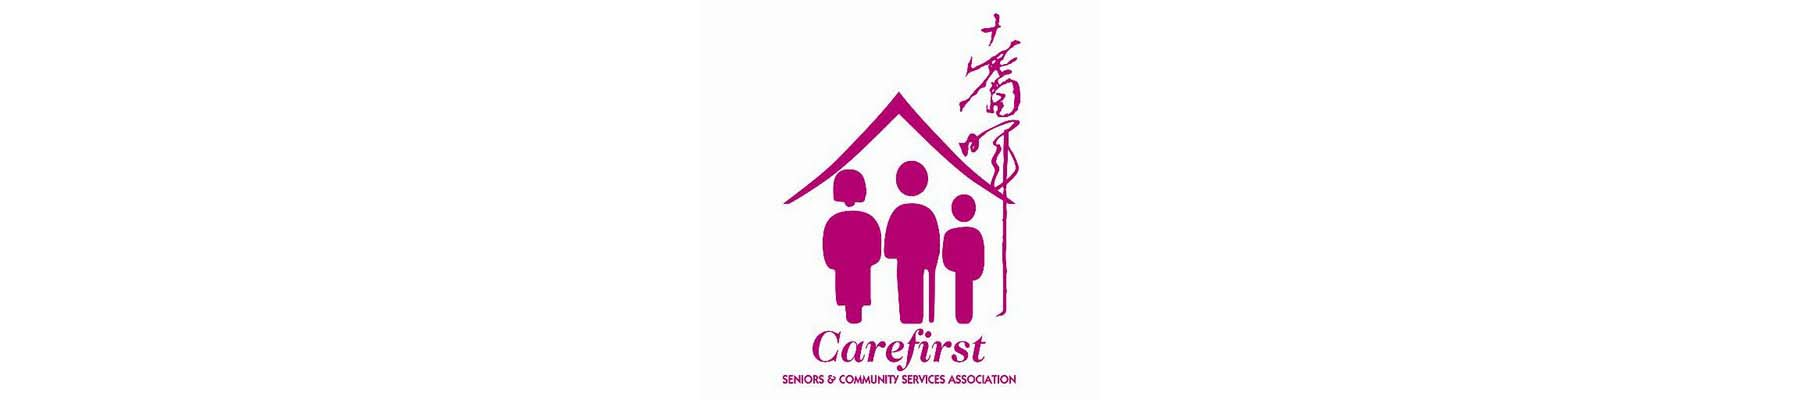 Carefirst Seniors & Community Services Association logo